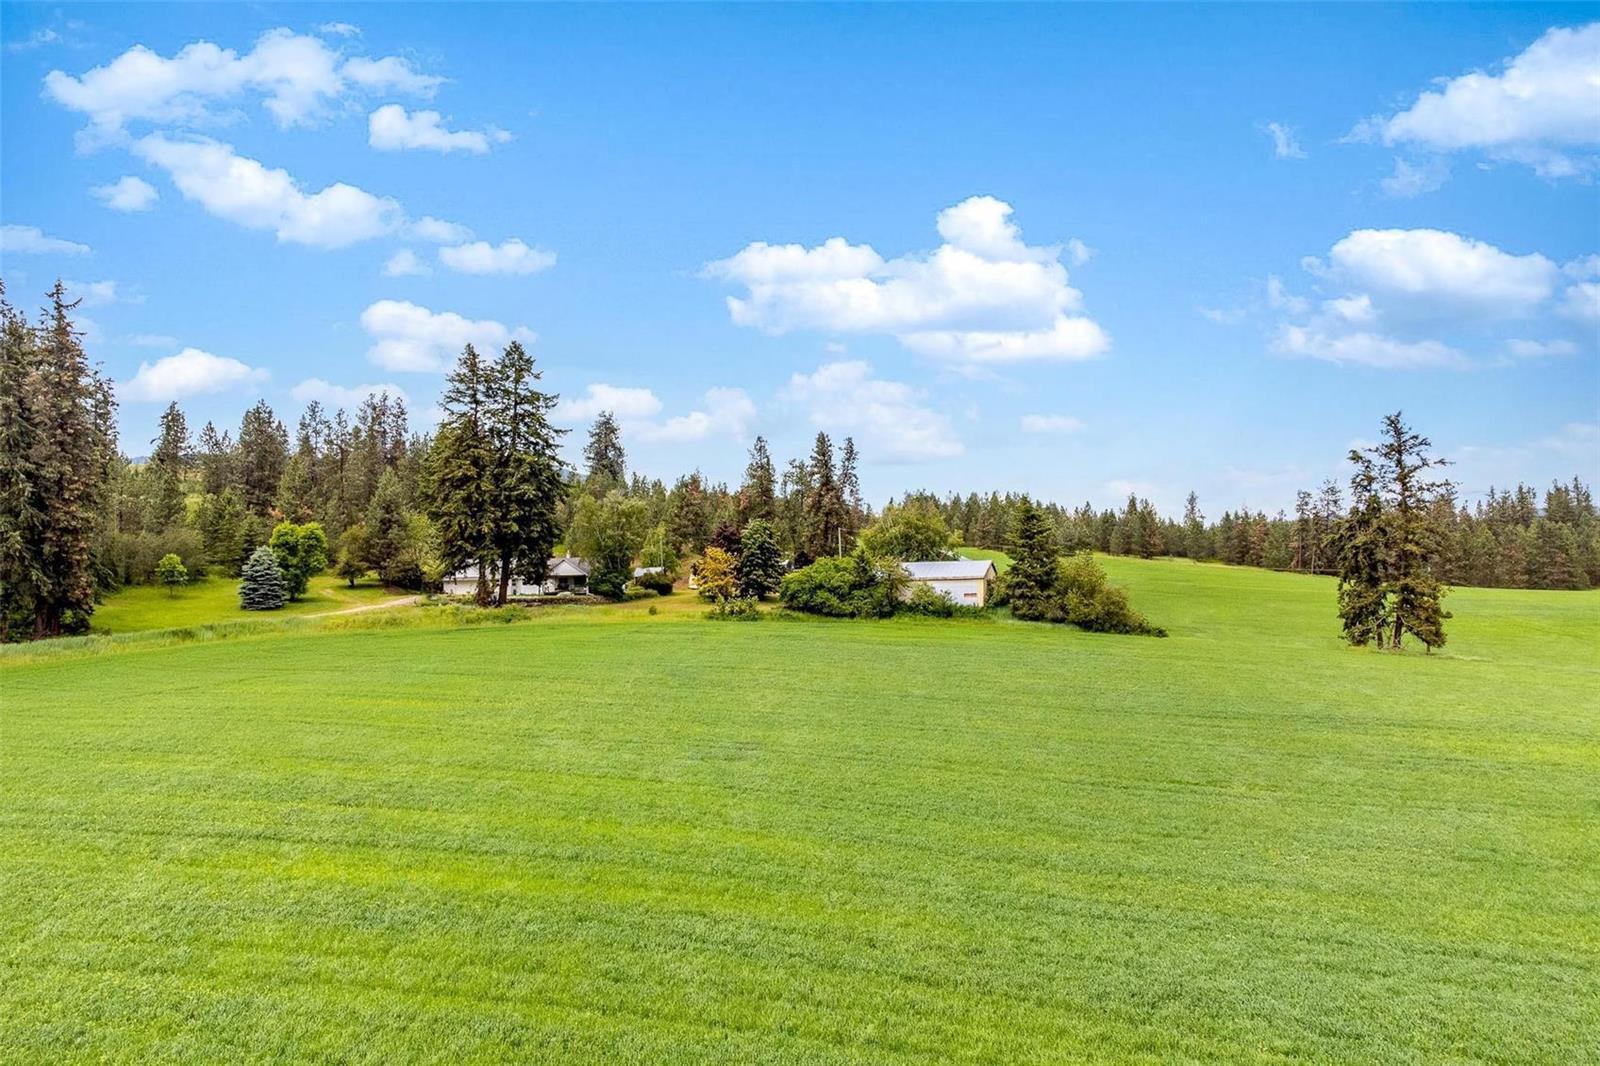 4602 Schubert Road,, Armstrong, British Columbia  V0E 1B4 - Photo 2 - 10232684